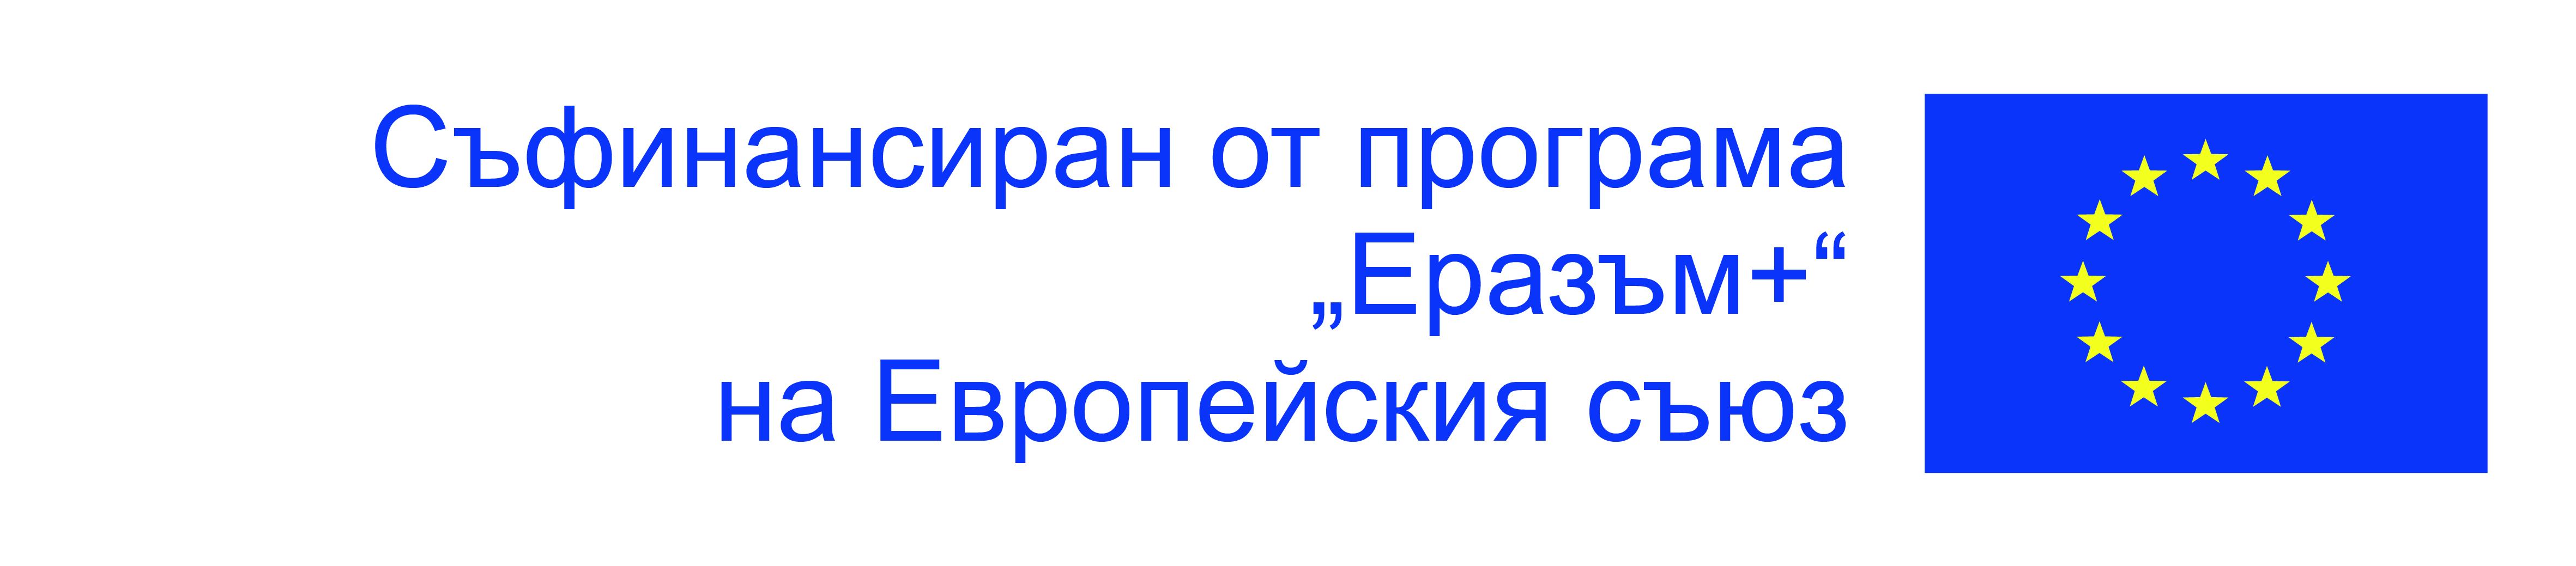 logosbeneficaireserasmusleft_bg_1